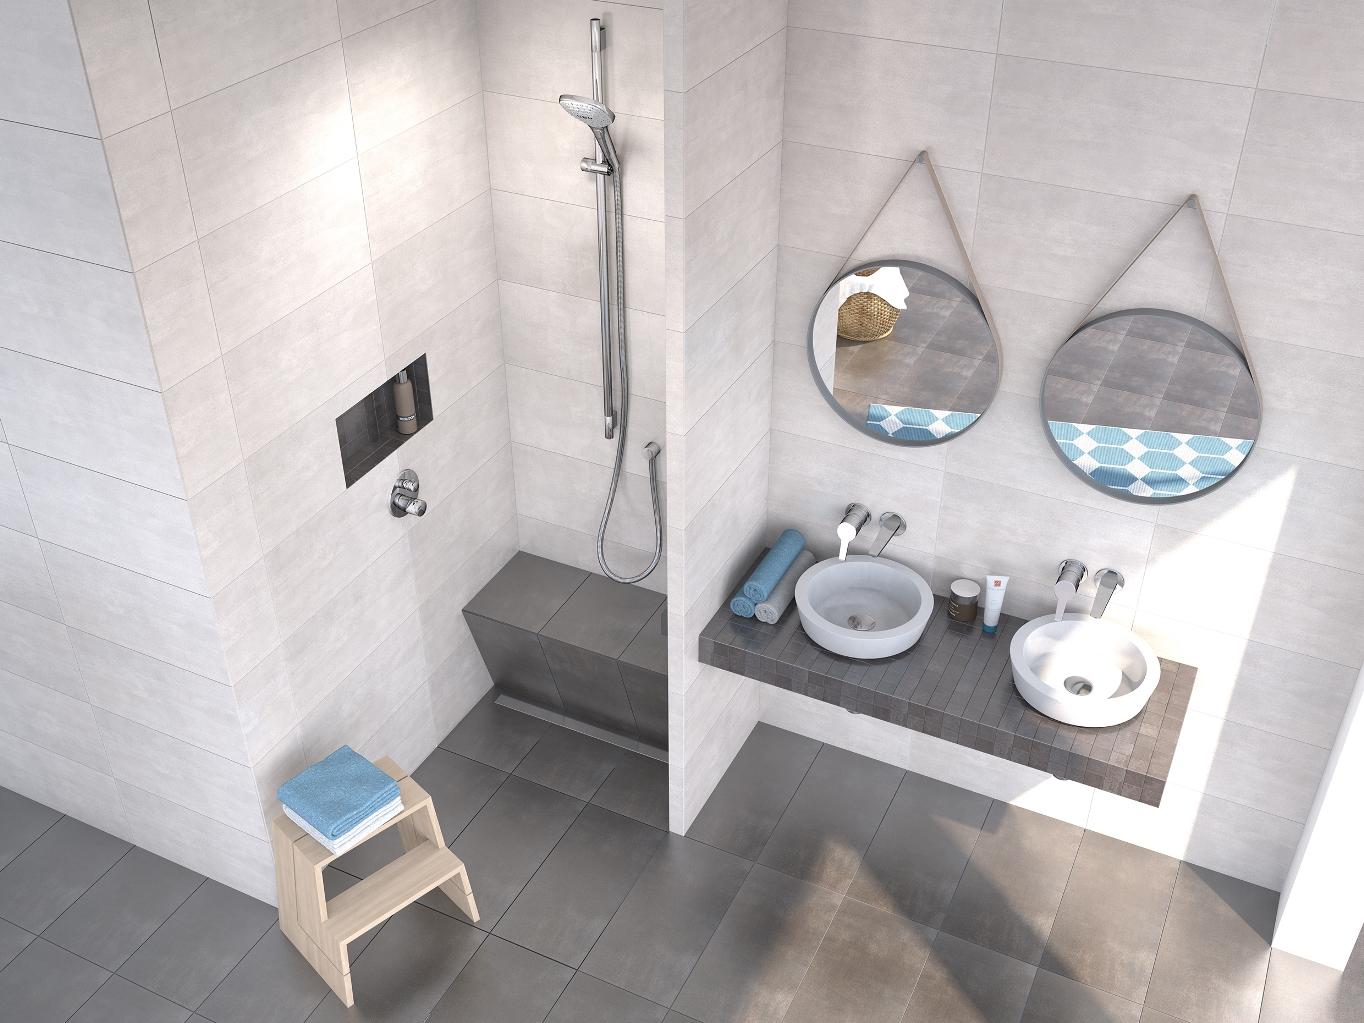 wedi fundo riolito neo genesee ceramic tile. Black Bedroom Furniture Sets. Home Design Ideas